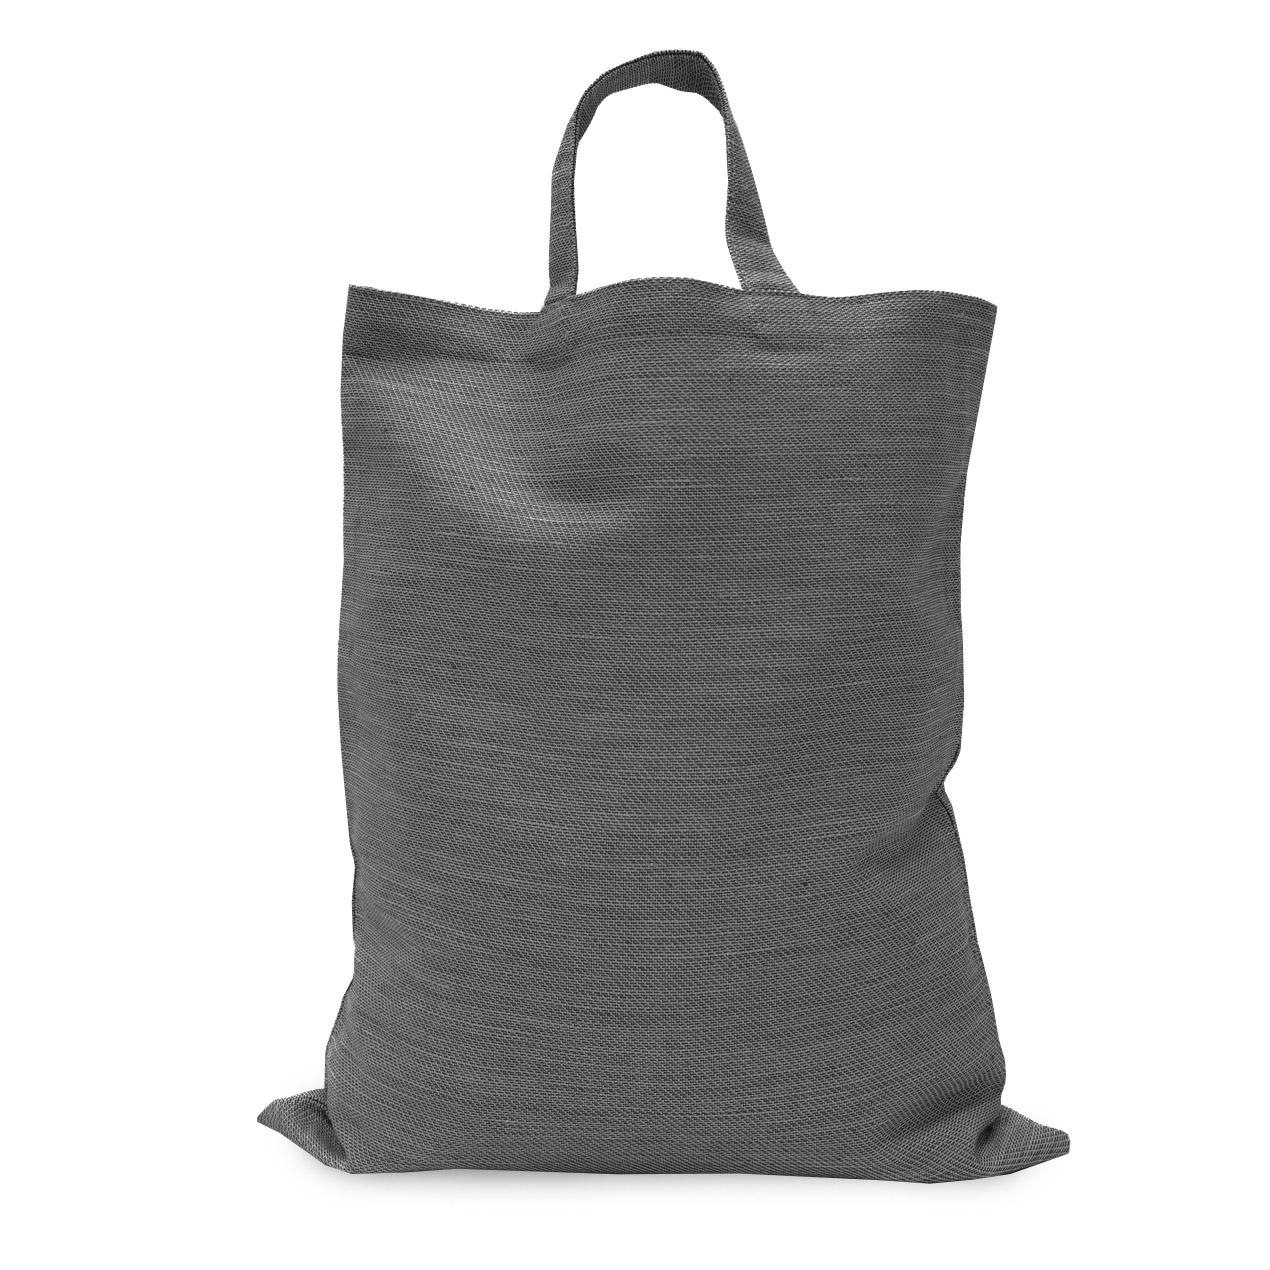 Polyester linen bag